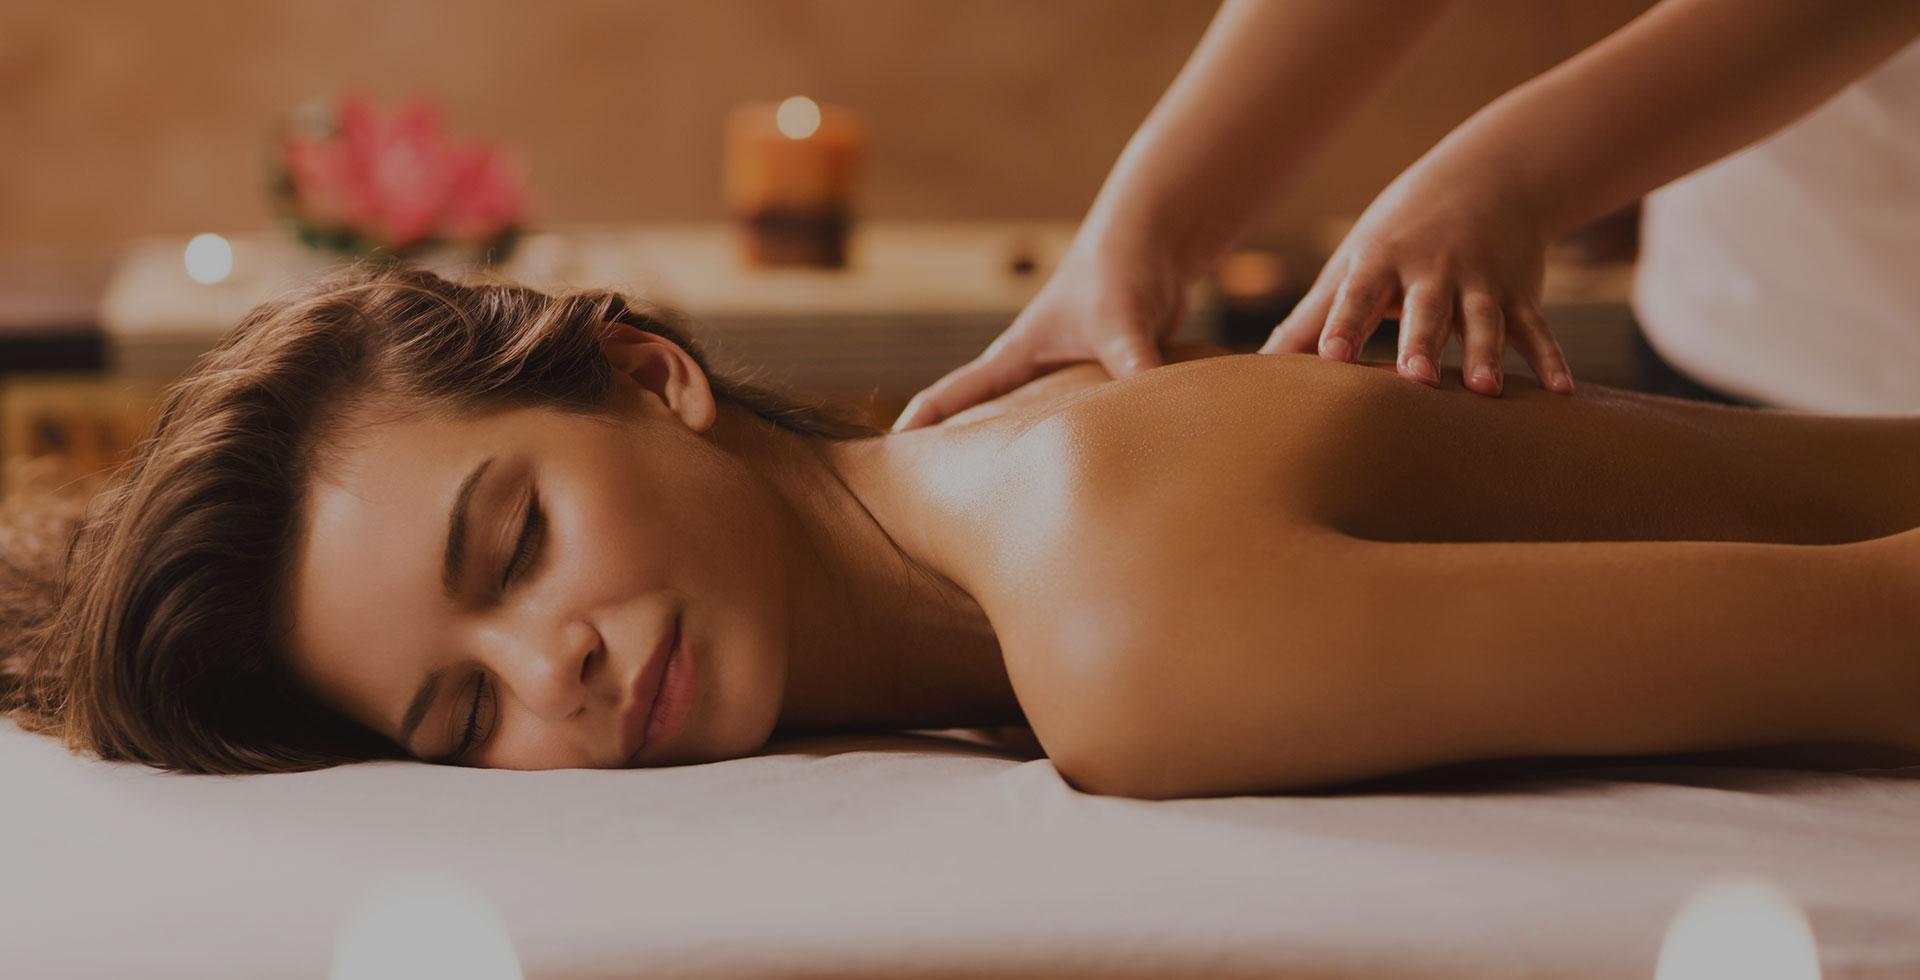 Nail_Garden_Michigan-massages